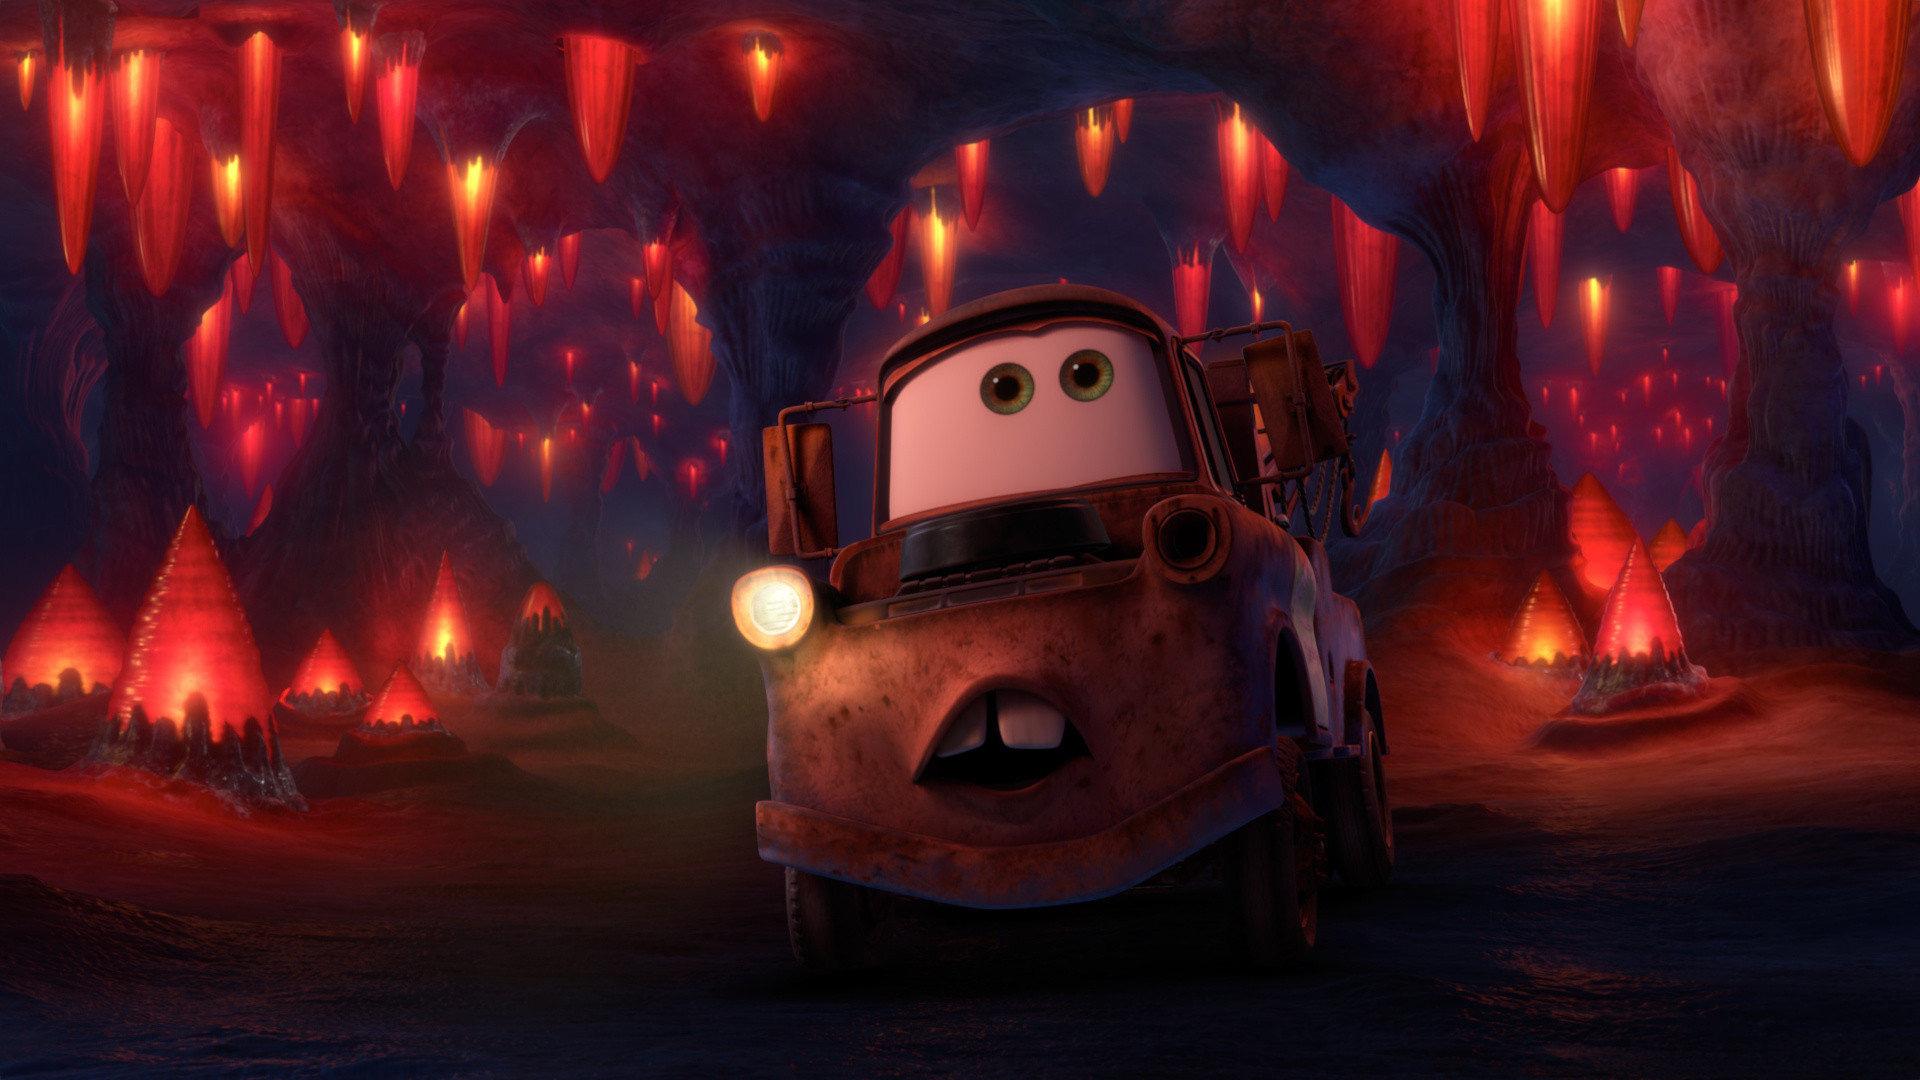 Pixar planet disney time travel mater cars toon martin mater